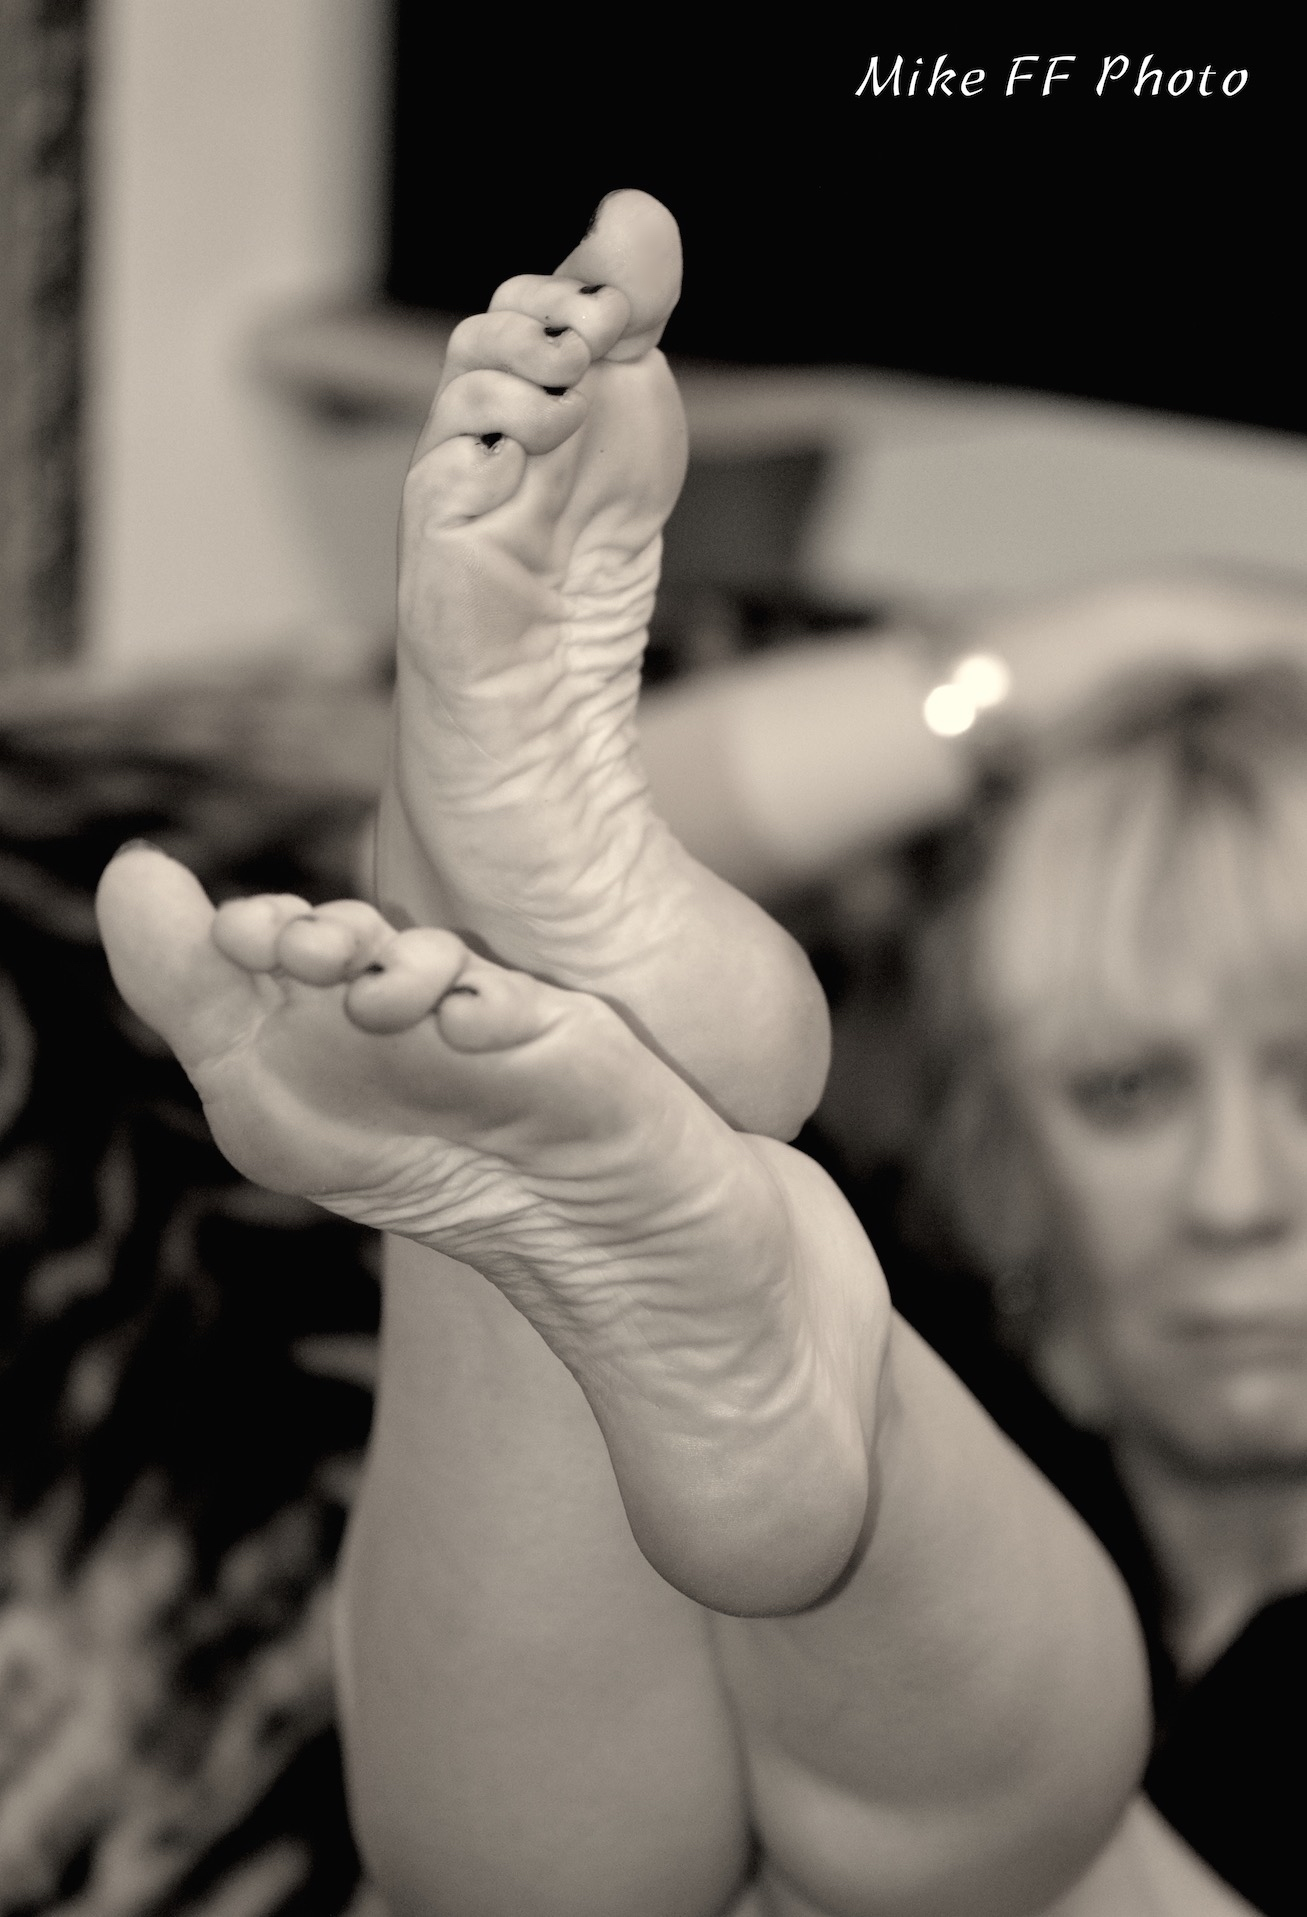 Legs-bare-legs-worship-foot-fetish-London-Mistress